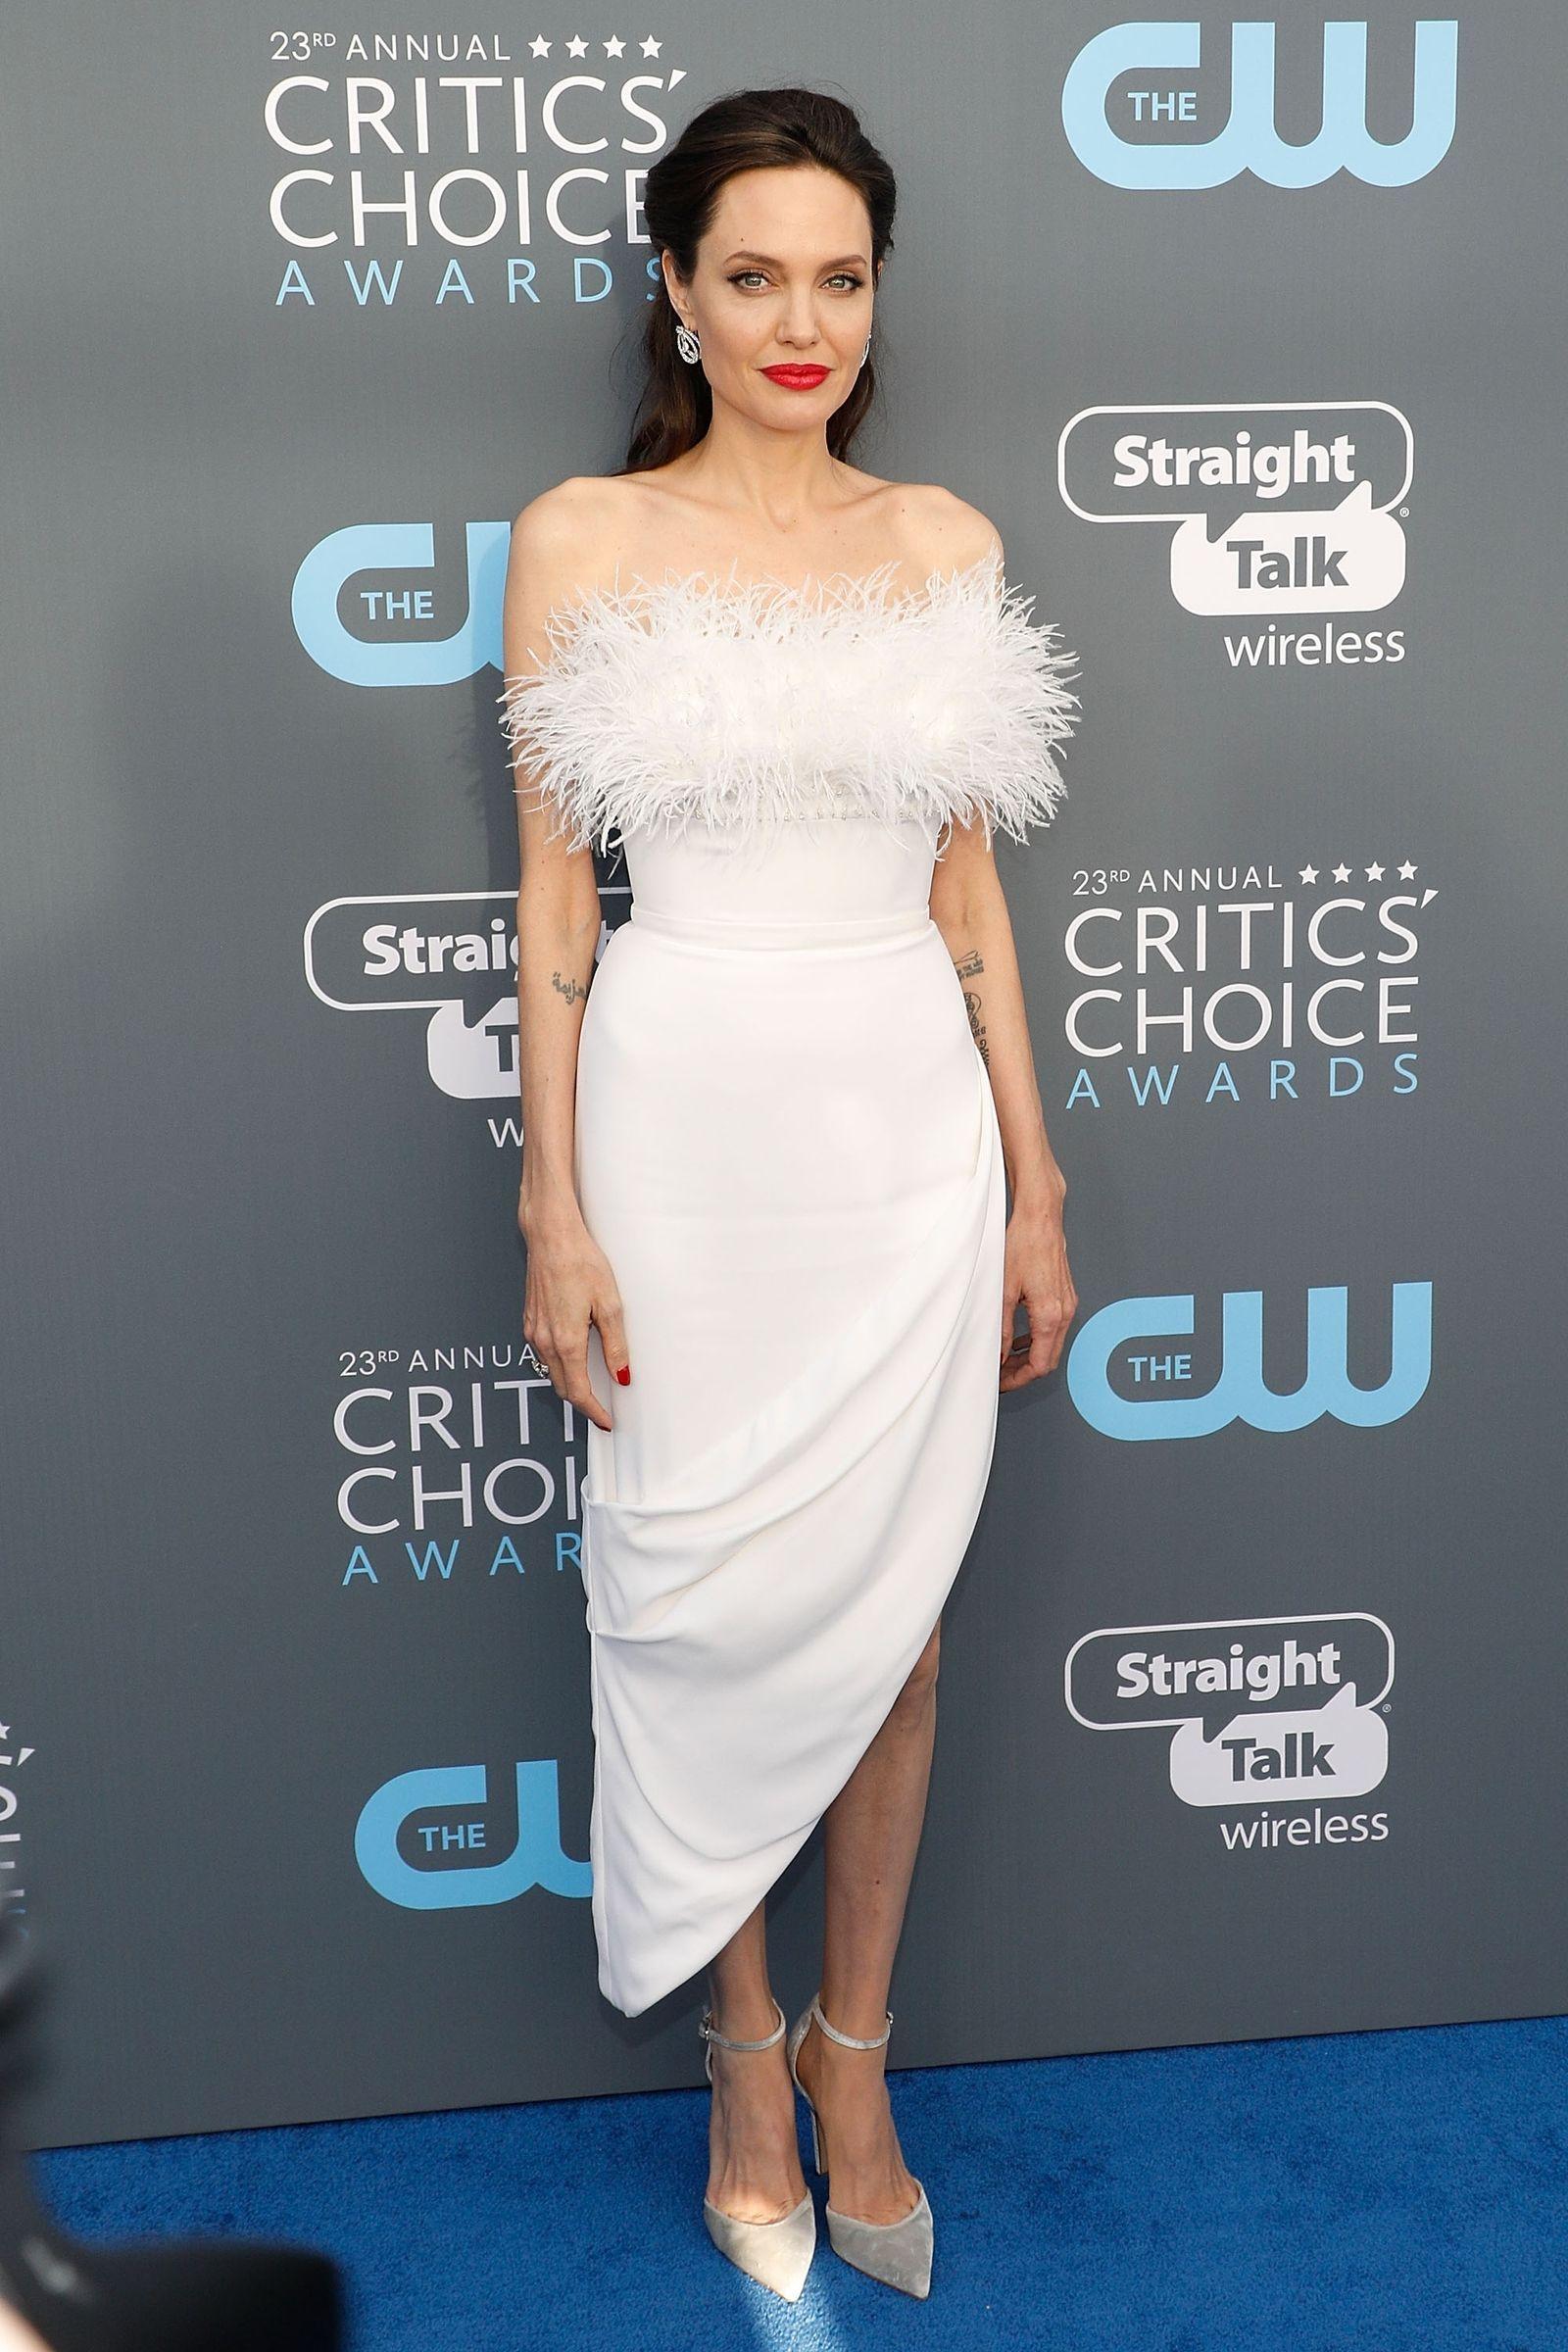 Critics Choice Awards 2018-Angelina Jolie in Ralph & Russo